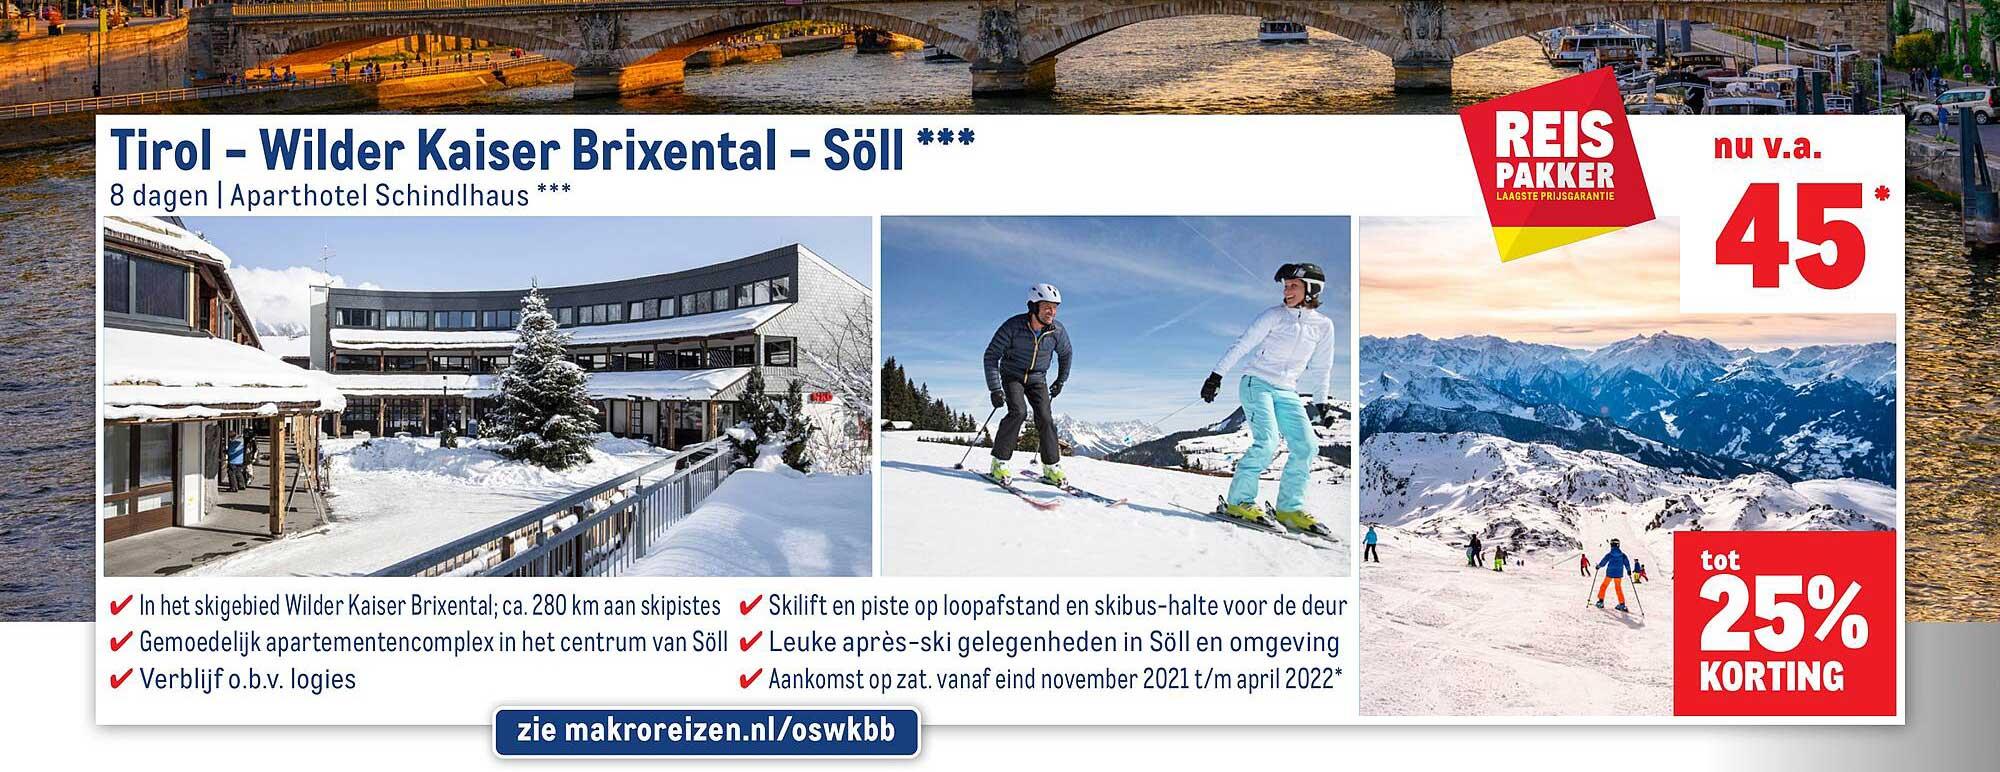 Makro Reizen Tirol - Wilder Kaiser Brixental - Söll Tot 25% Korting